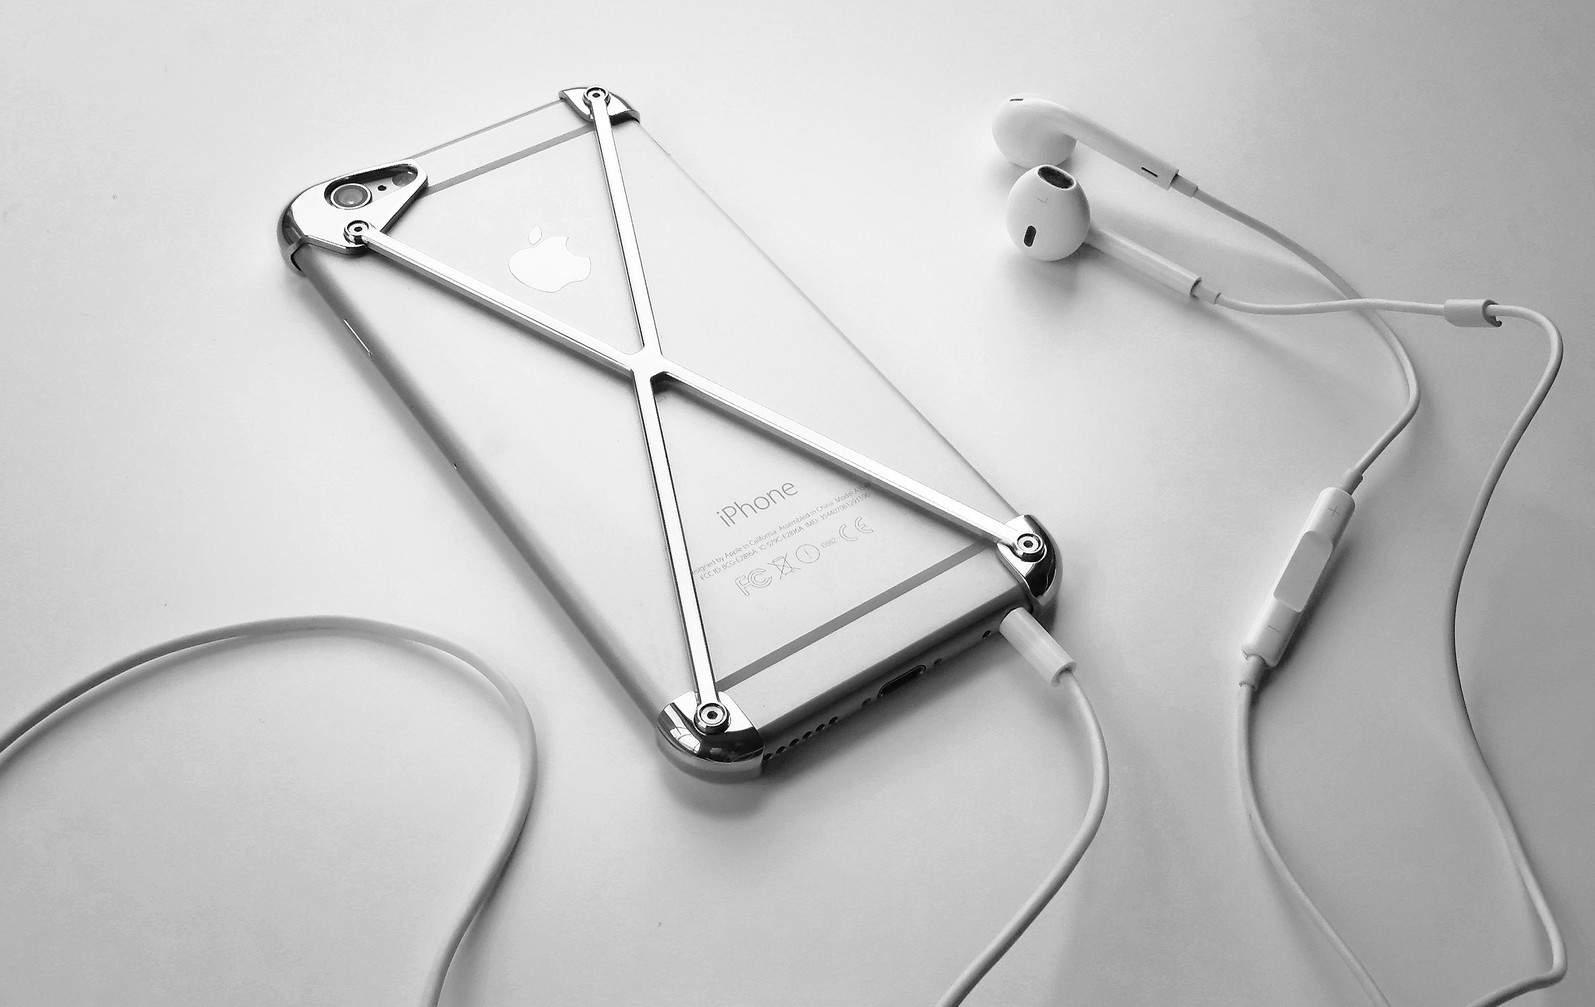 Radius V2 iPhone 6